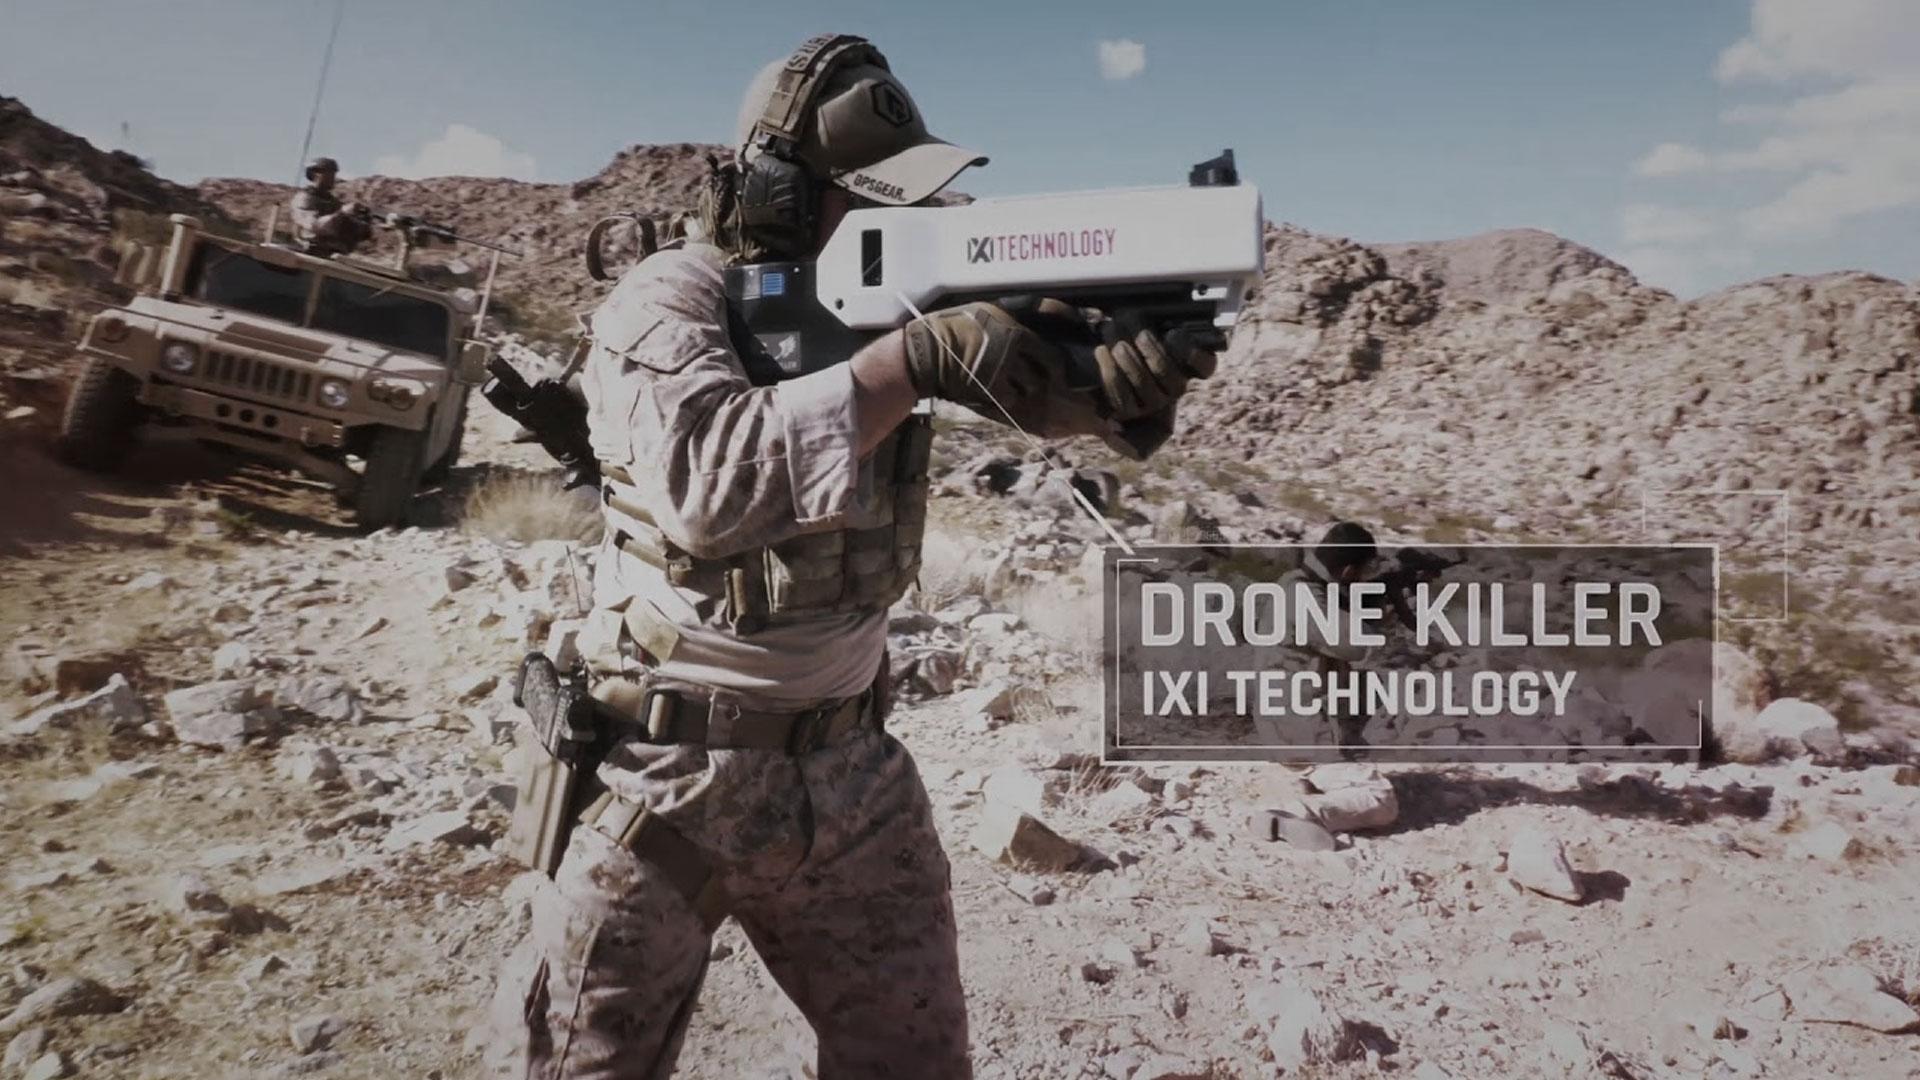 ixi technology dronekiller anti-drone